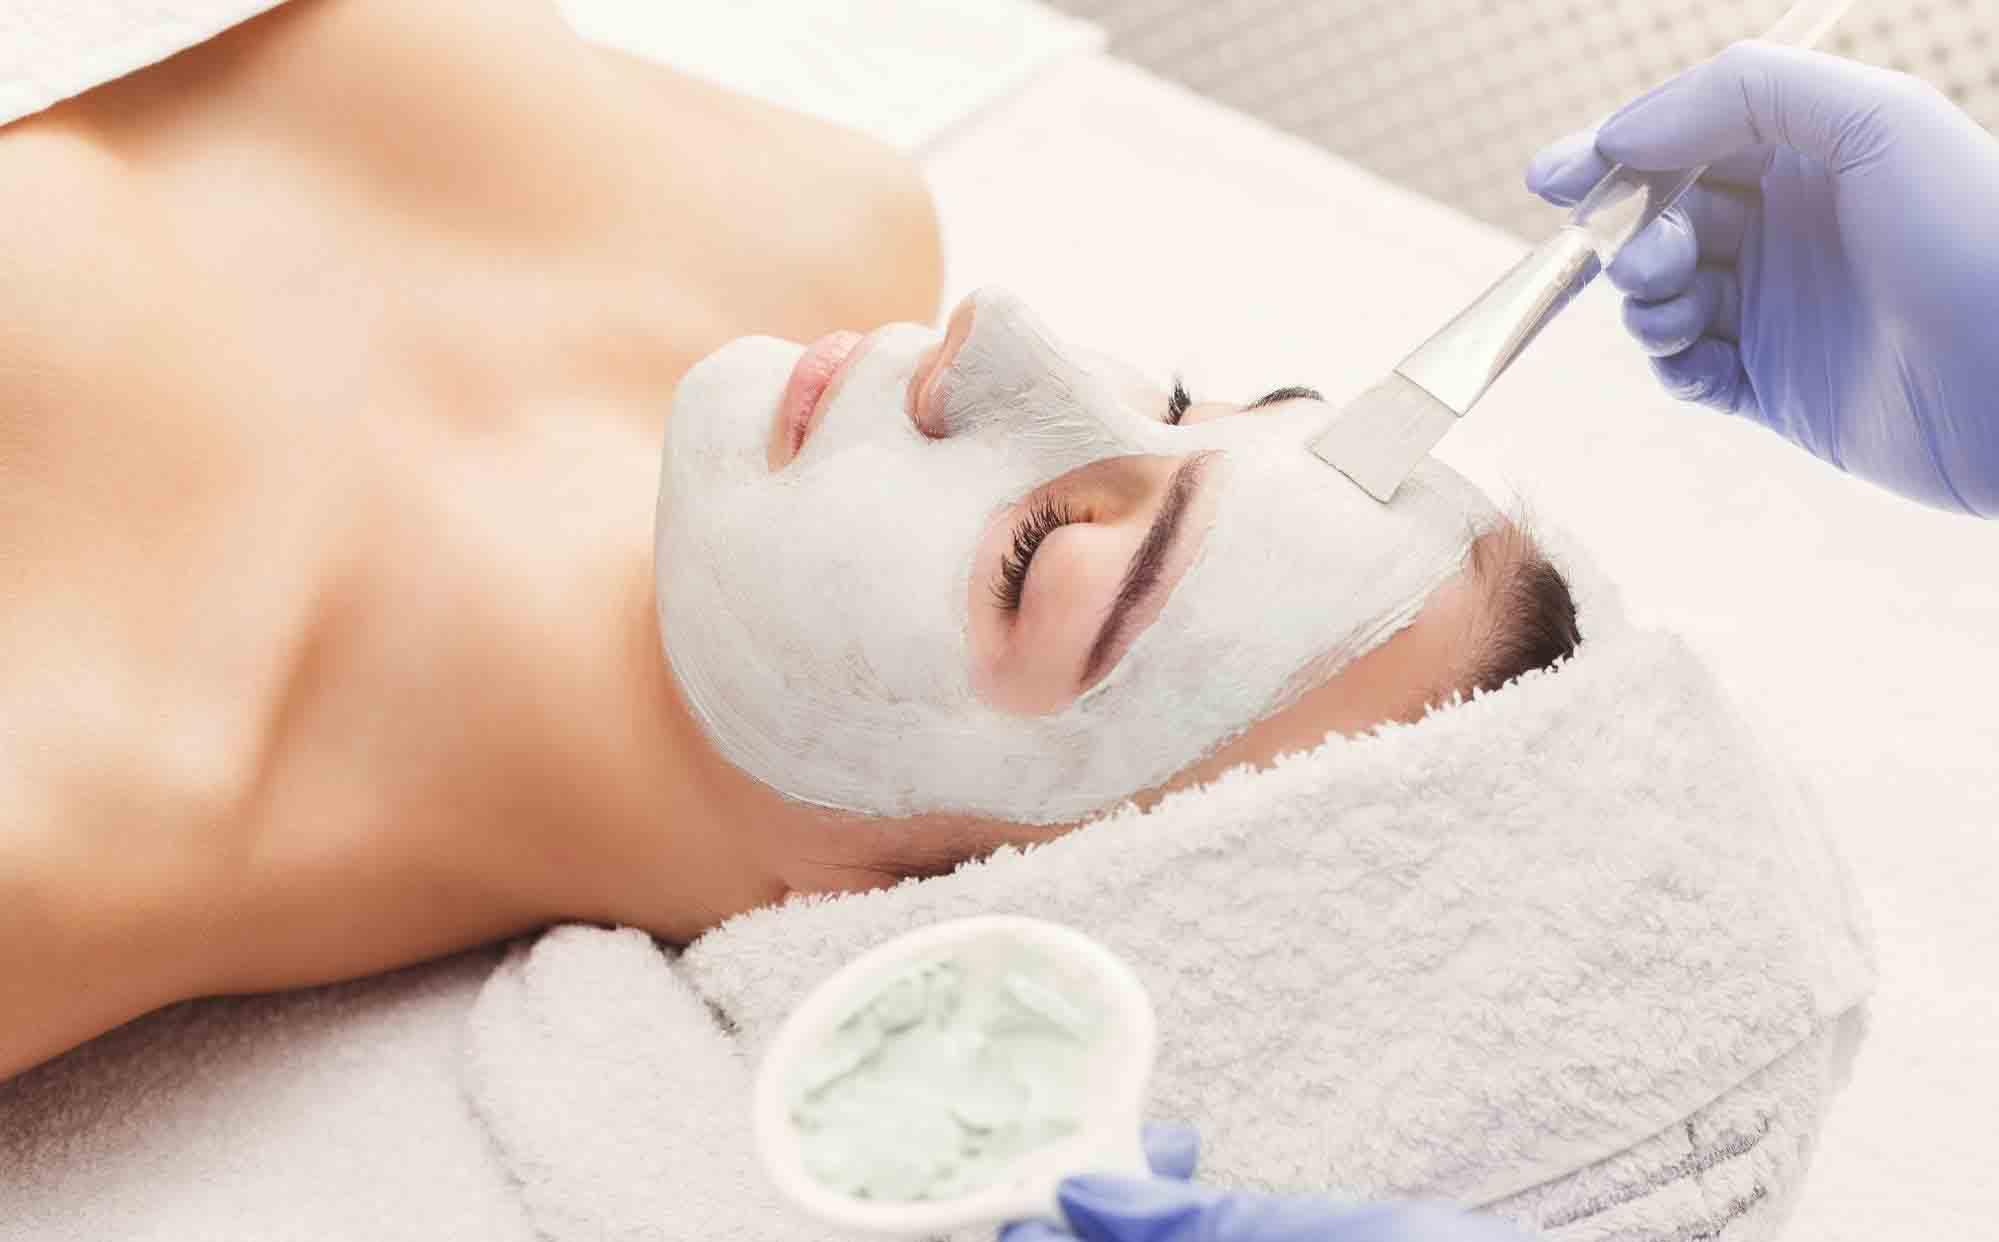 equipamentos clinica estetica mascaras descartaveis luvas pinceis toalhas